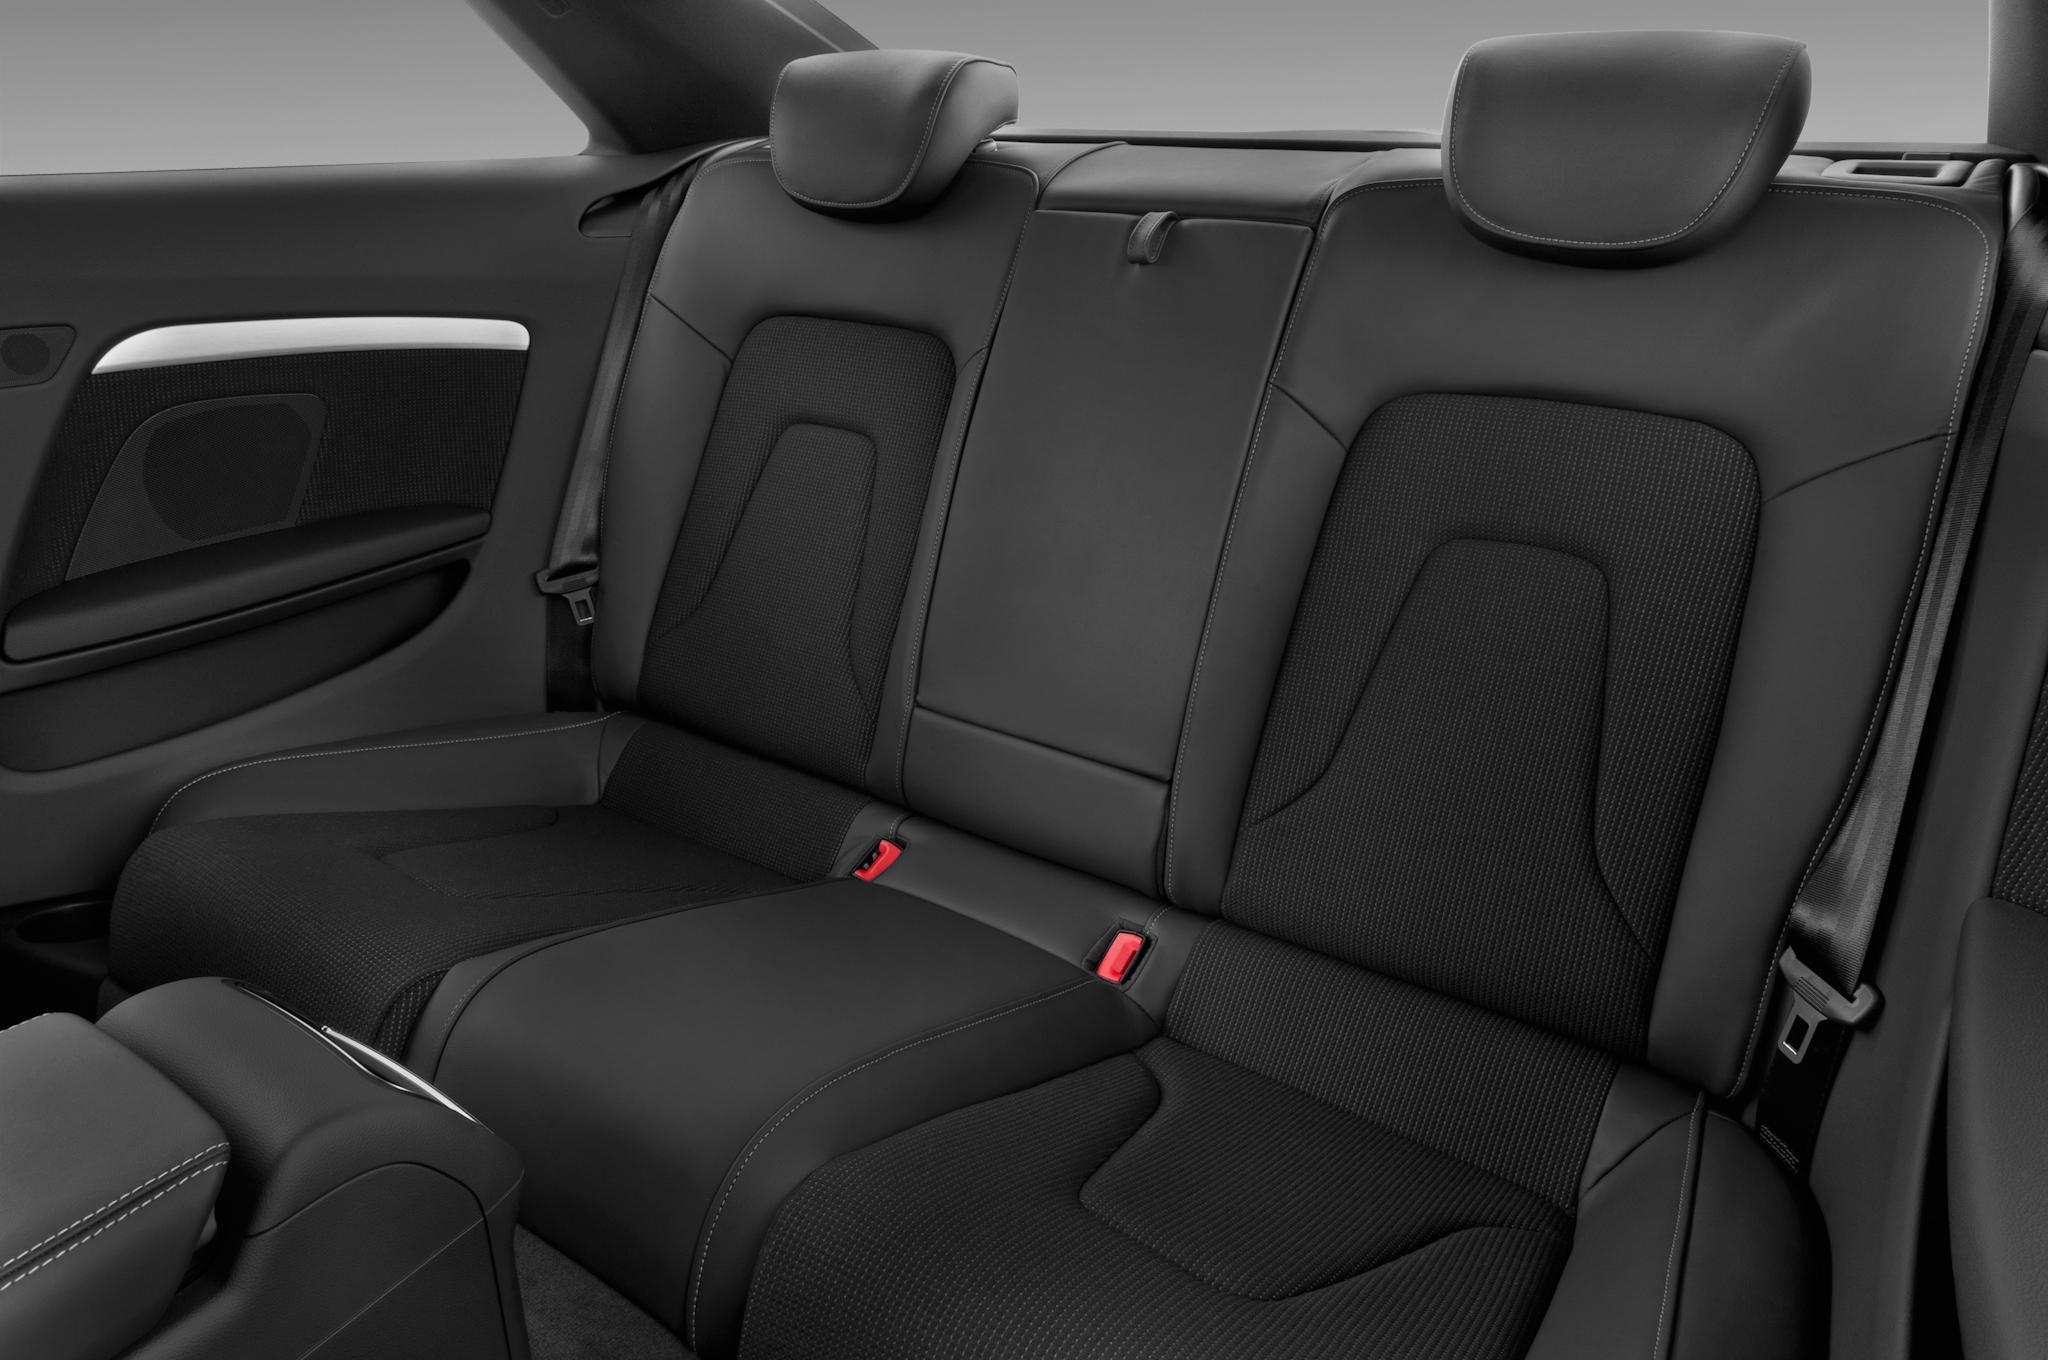 audi a5 interior rear seat